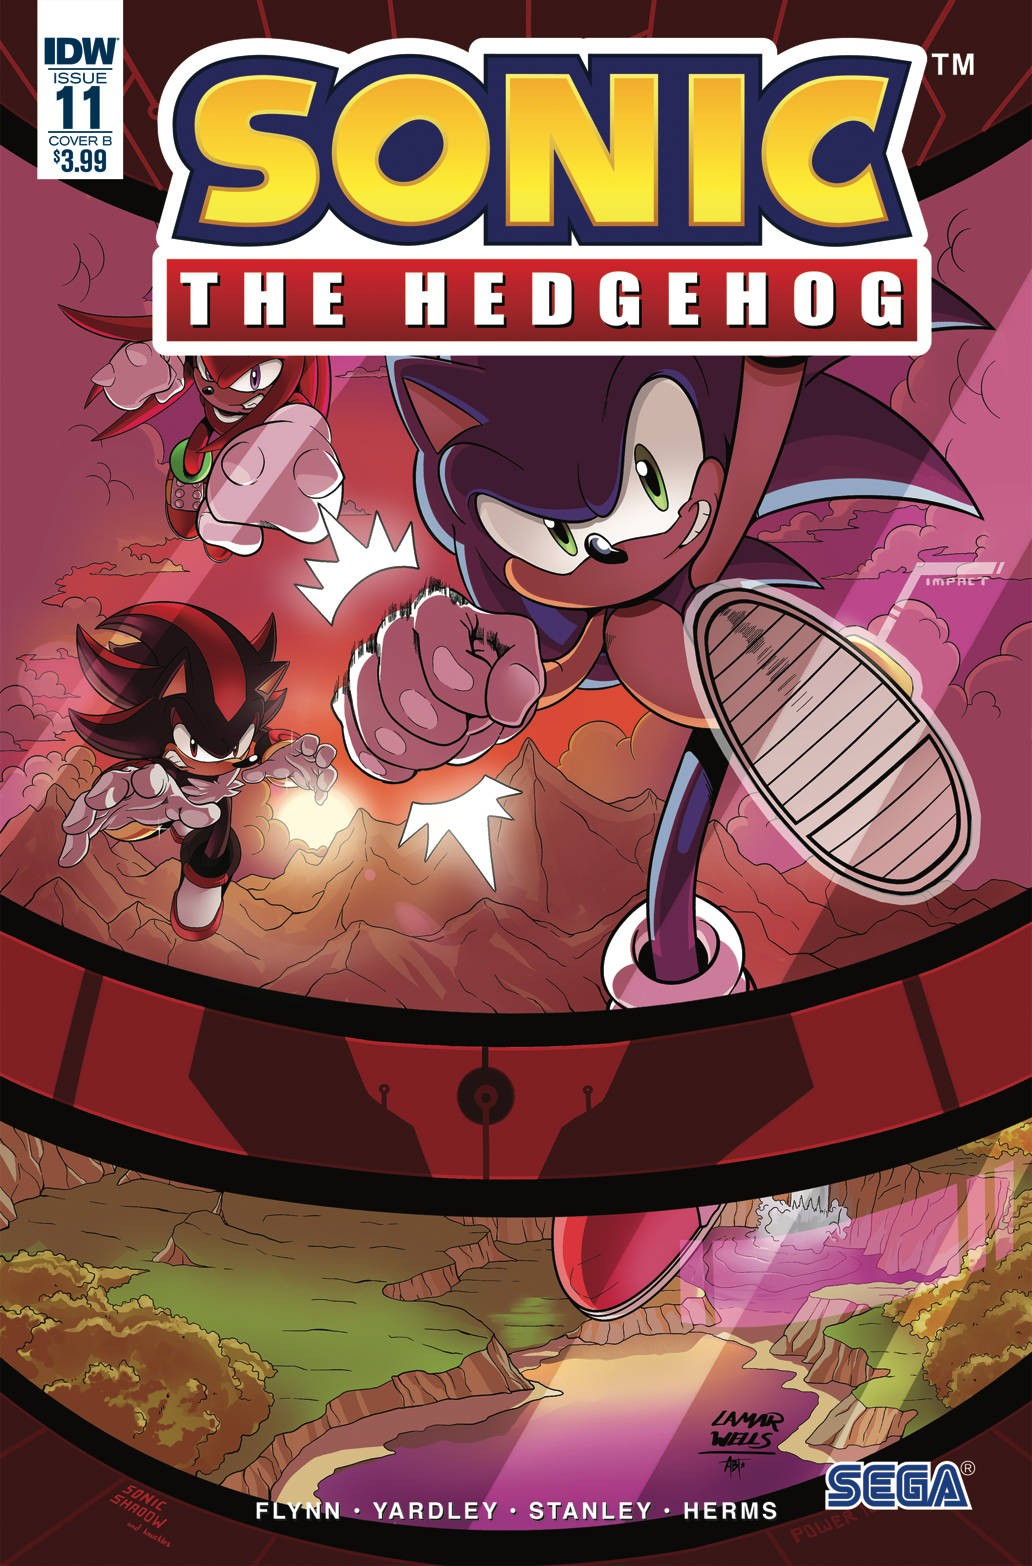 Idw Sonic The Hedgehog 11 Comic Book Tracy Yardley Cover B Variant 739761815287 Ebay